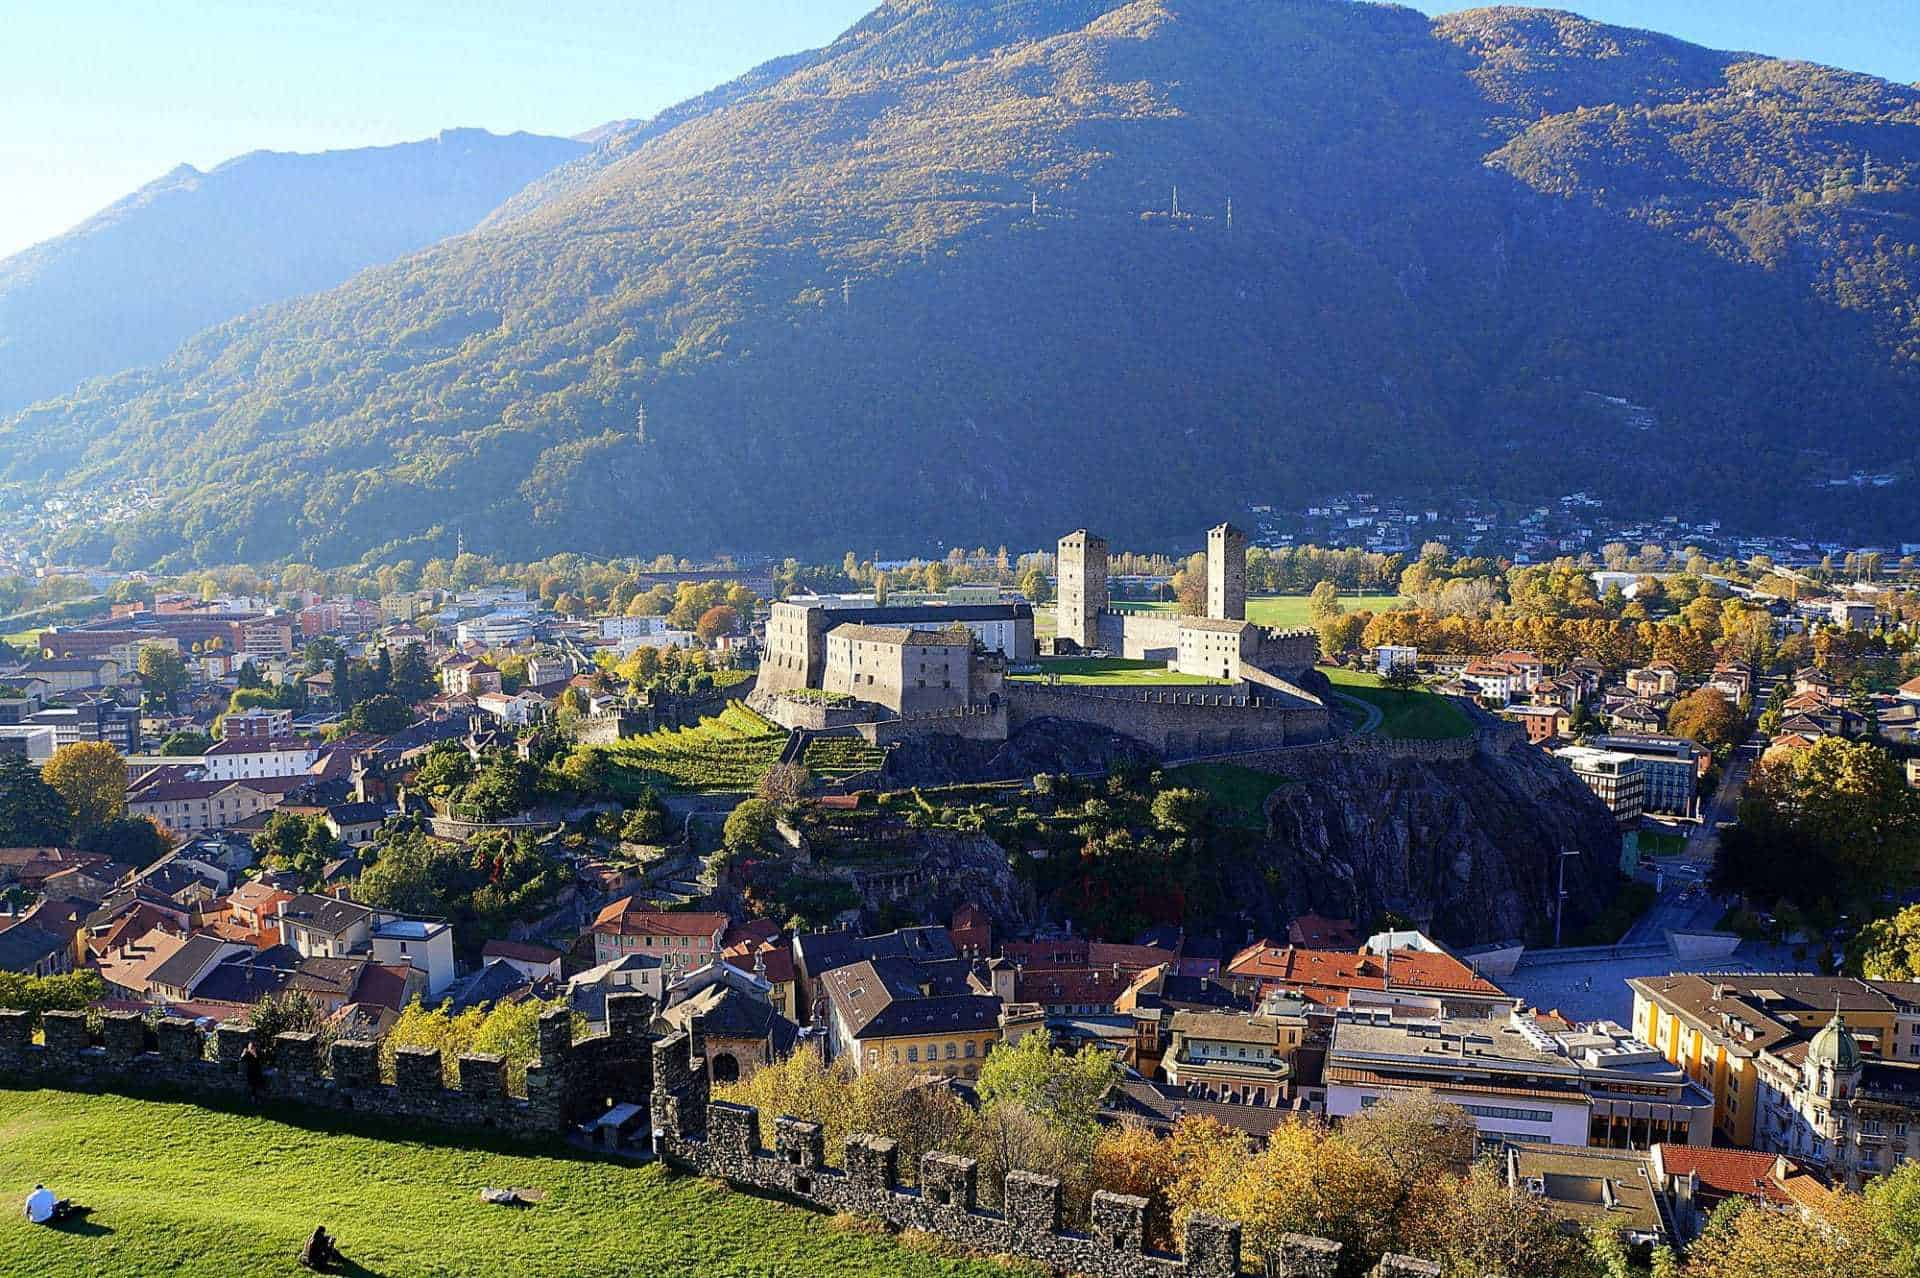 casalgrande_castello_bellinzona_svizzera